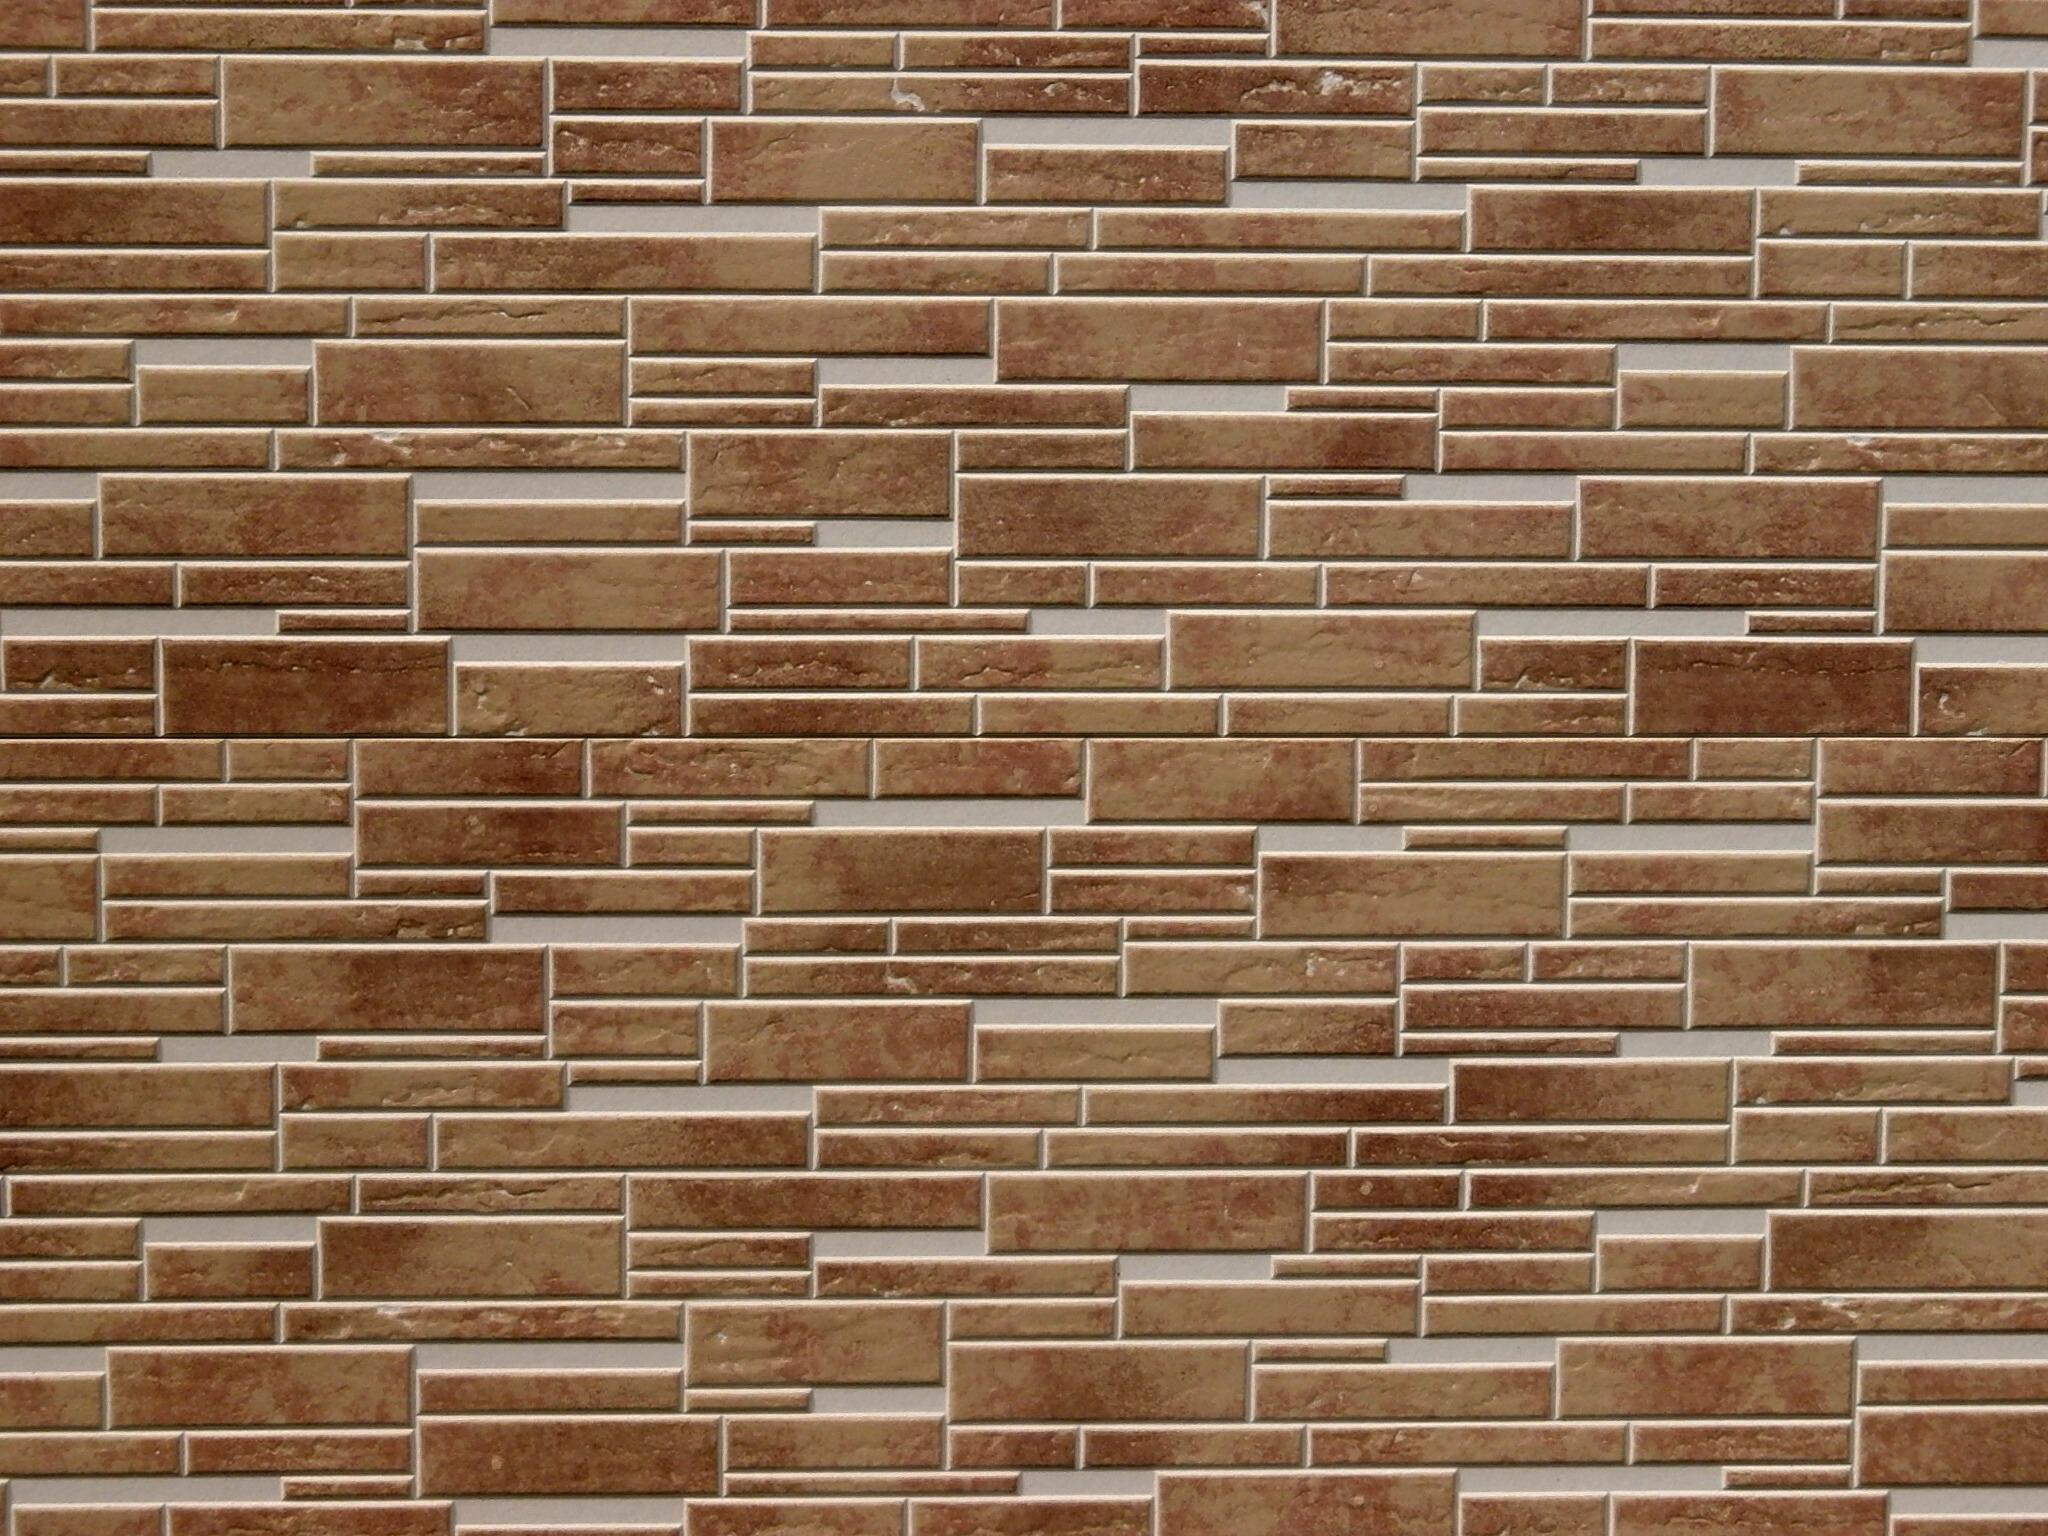 Wood background texture wooden tiles free image wood background - Wood Texture Floor Wall Brown Tile Brick Material Art Background Hardwood Brickwork Flooring